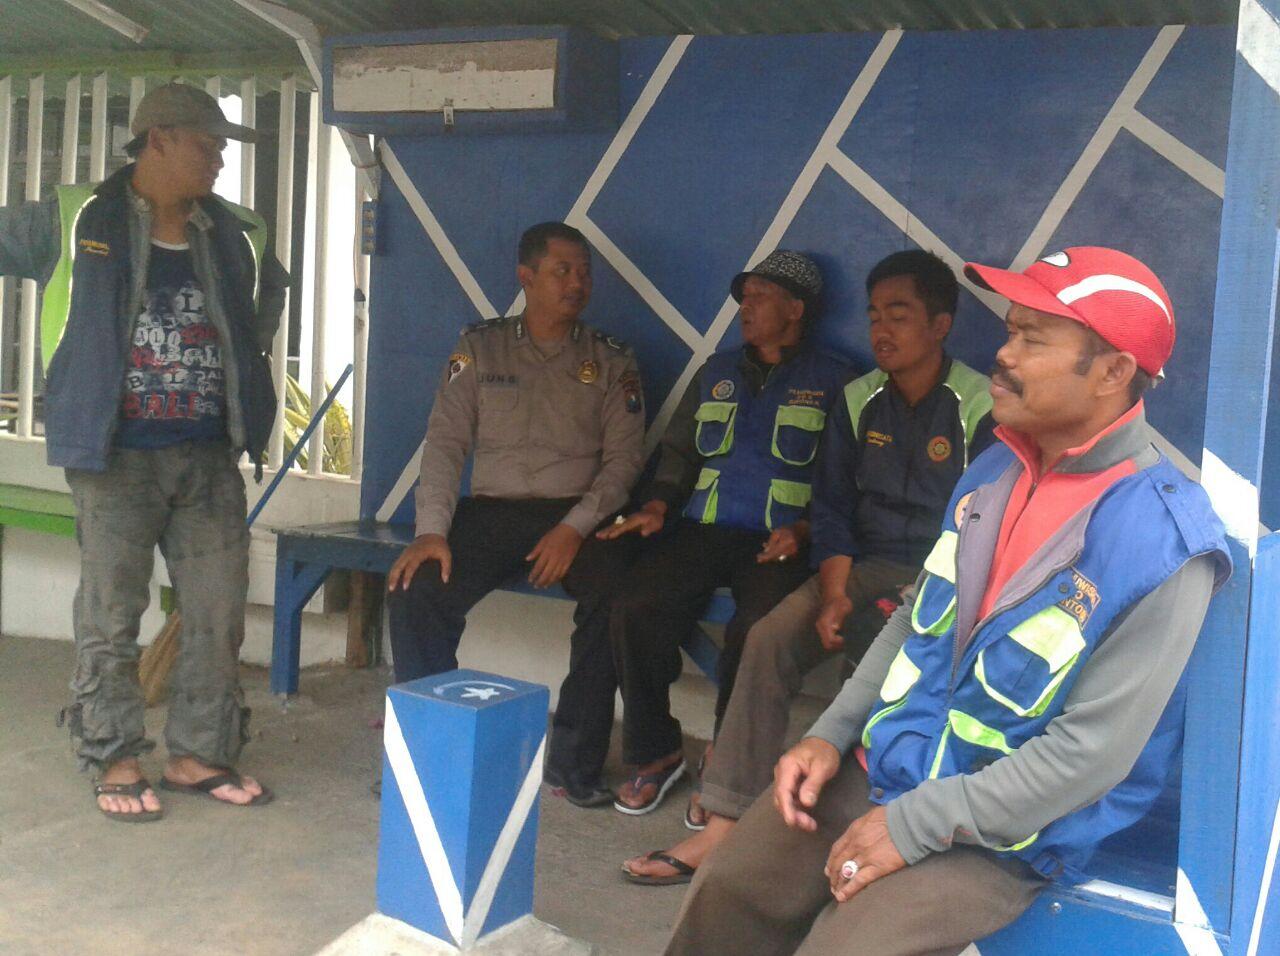 Bhabinkamtibmas Kelurahan Songgokerto Polsek Batu Kota Laksanakan Binluh Kamtibmas Kepada Anggota Pramuwisata Songgoriti